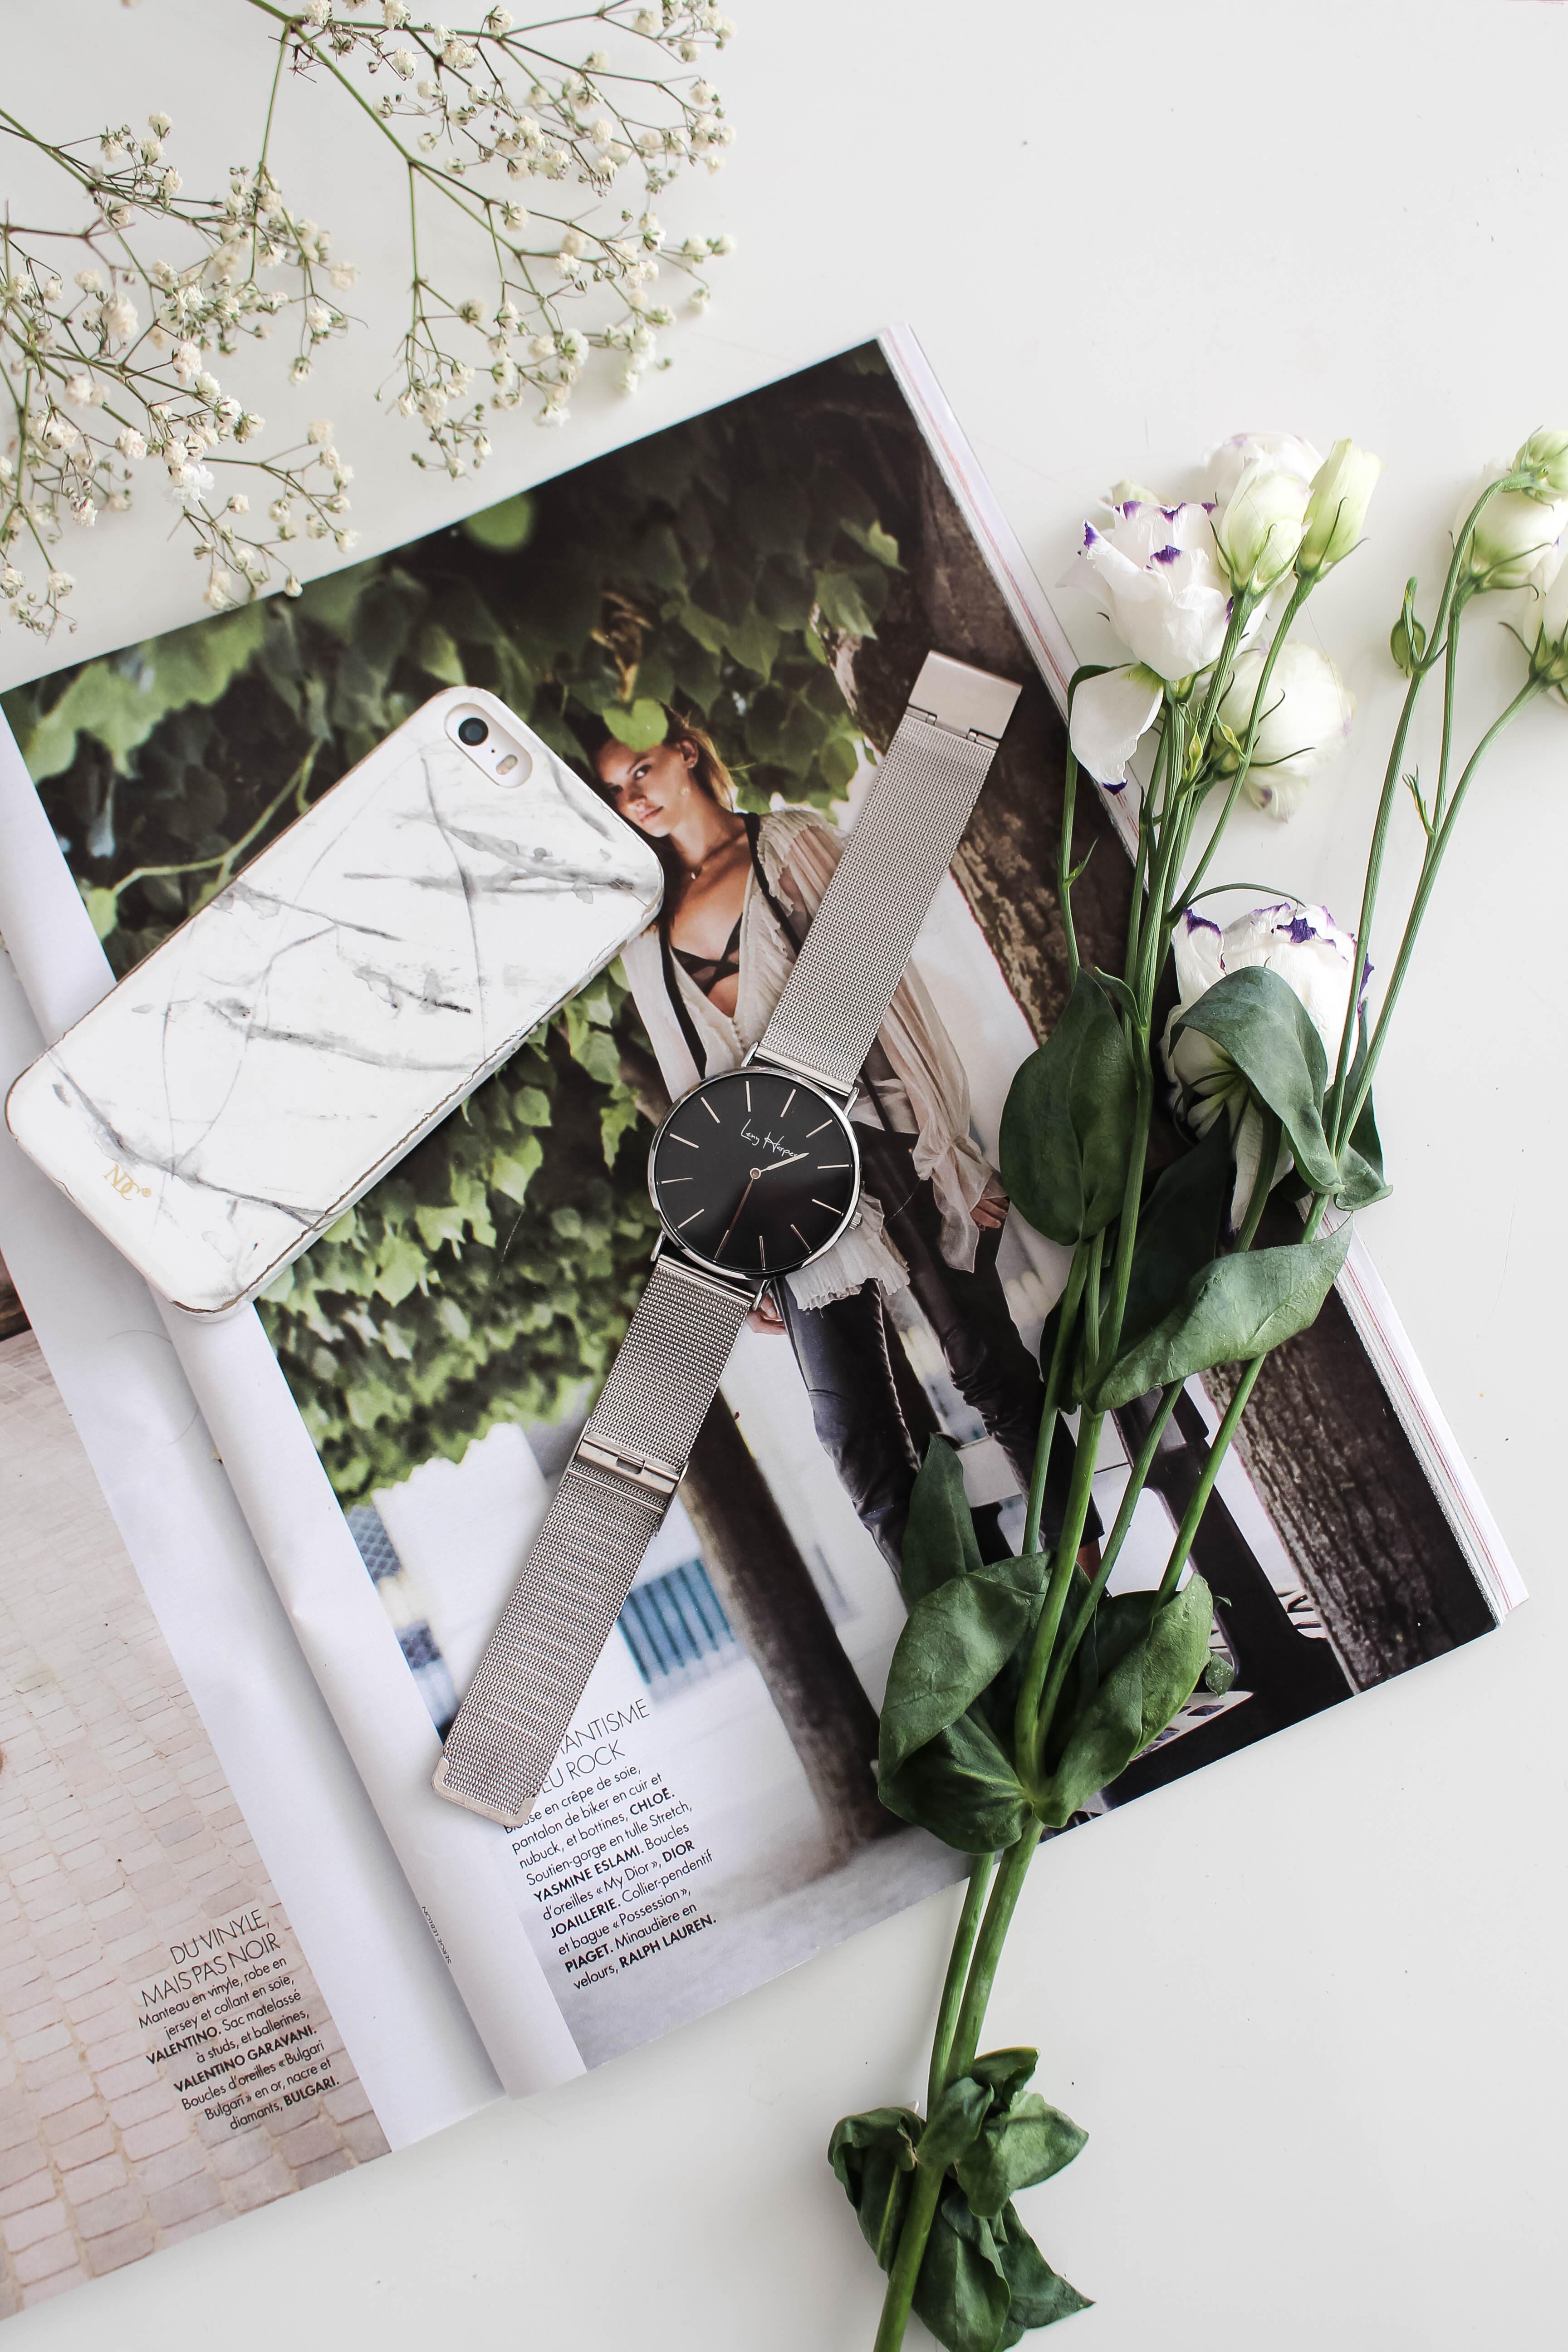 blog-conseils-instagram-linstantflo-14-sur-14